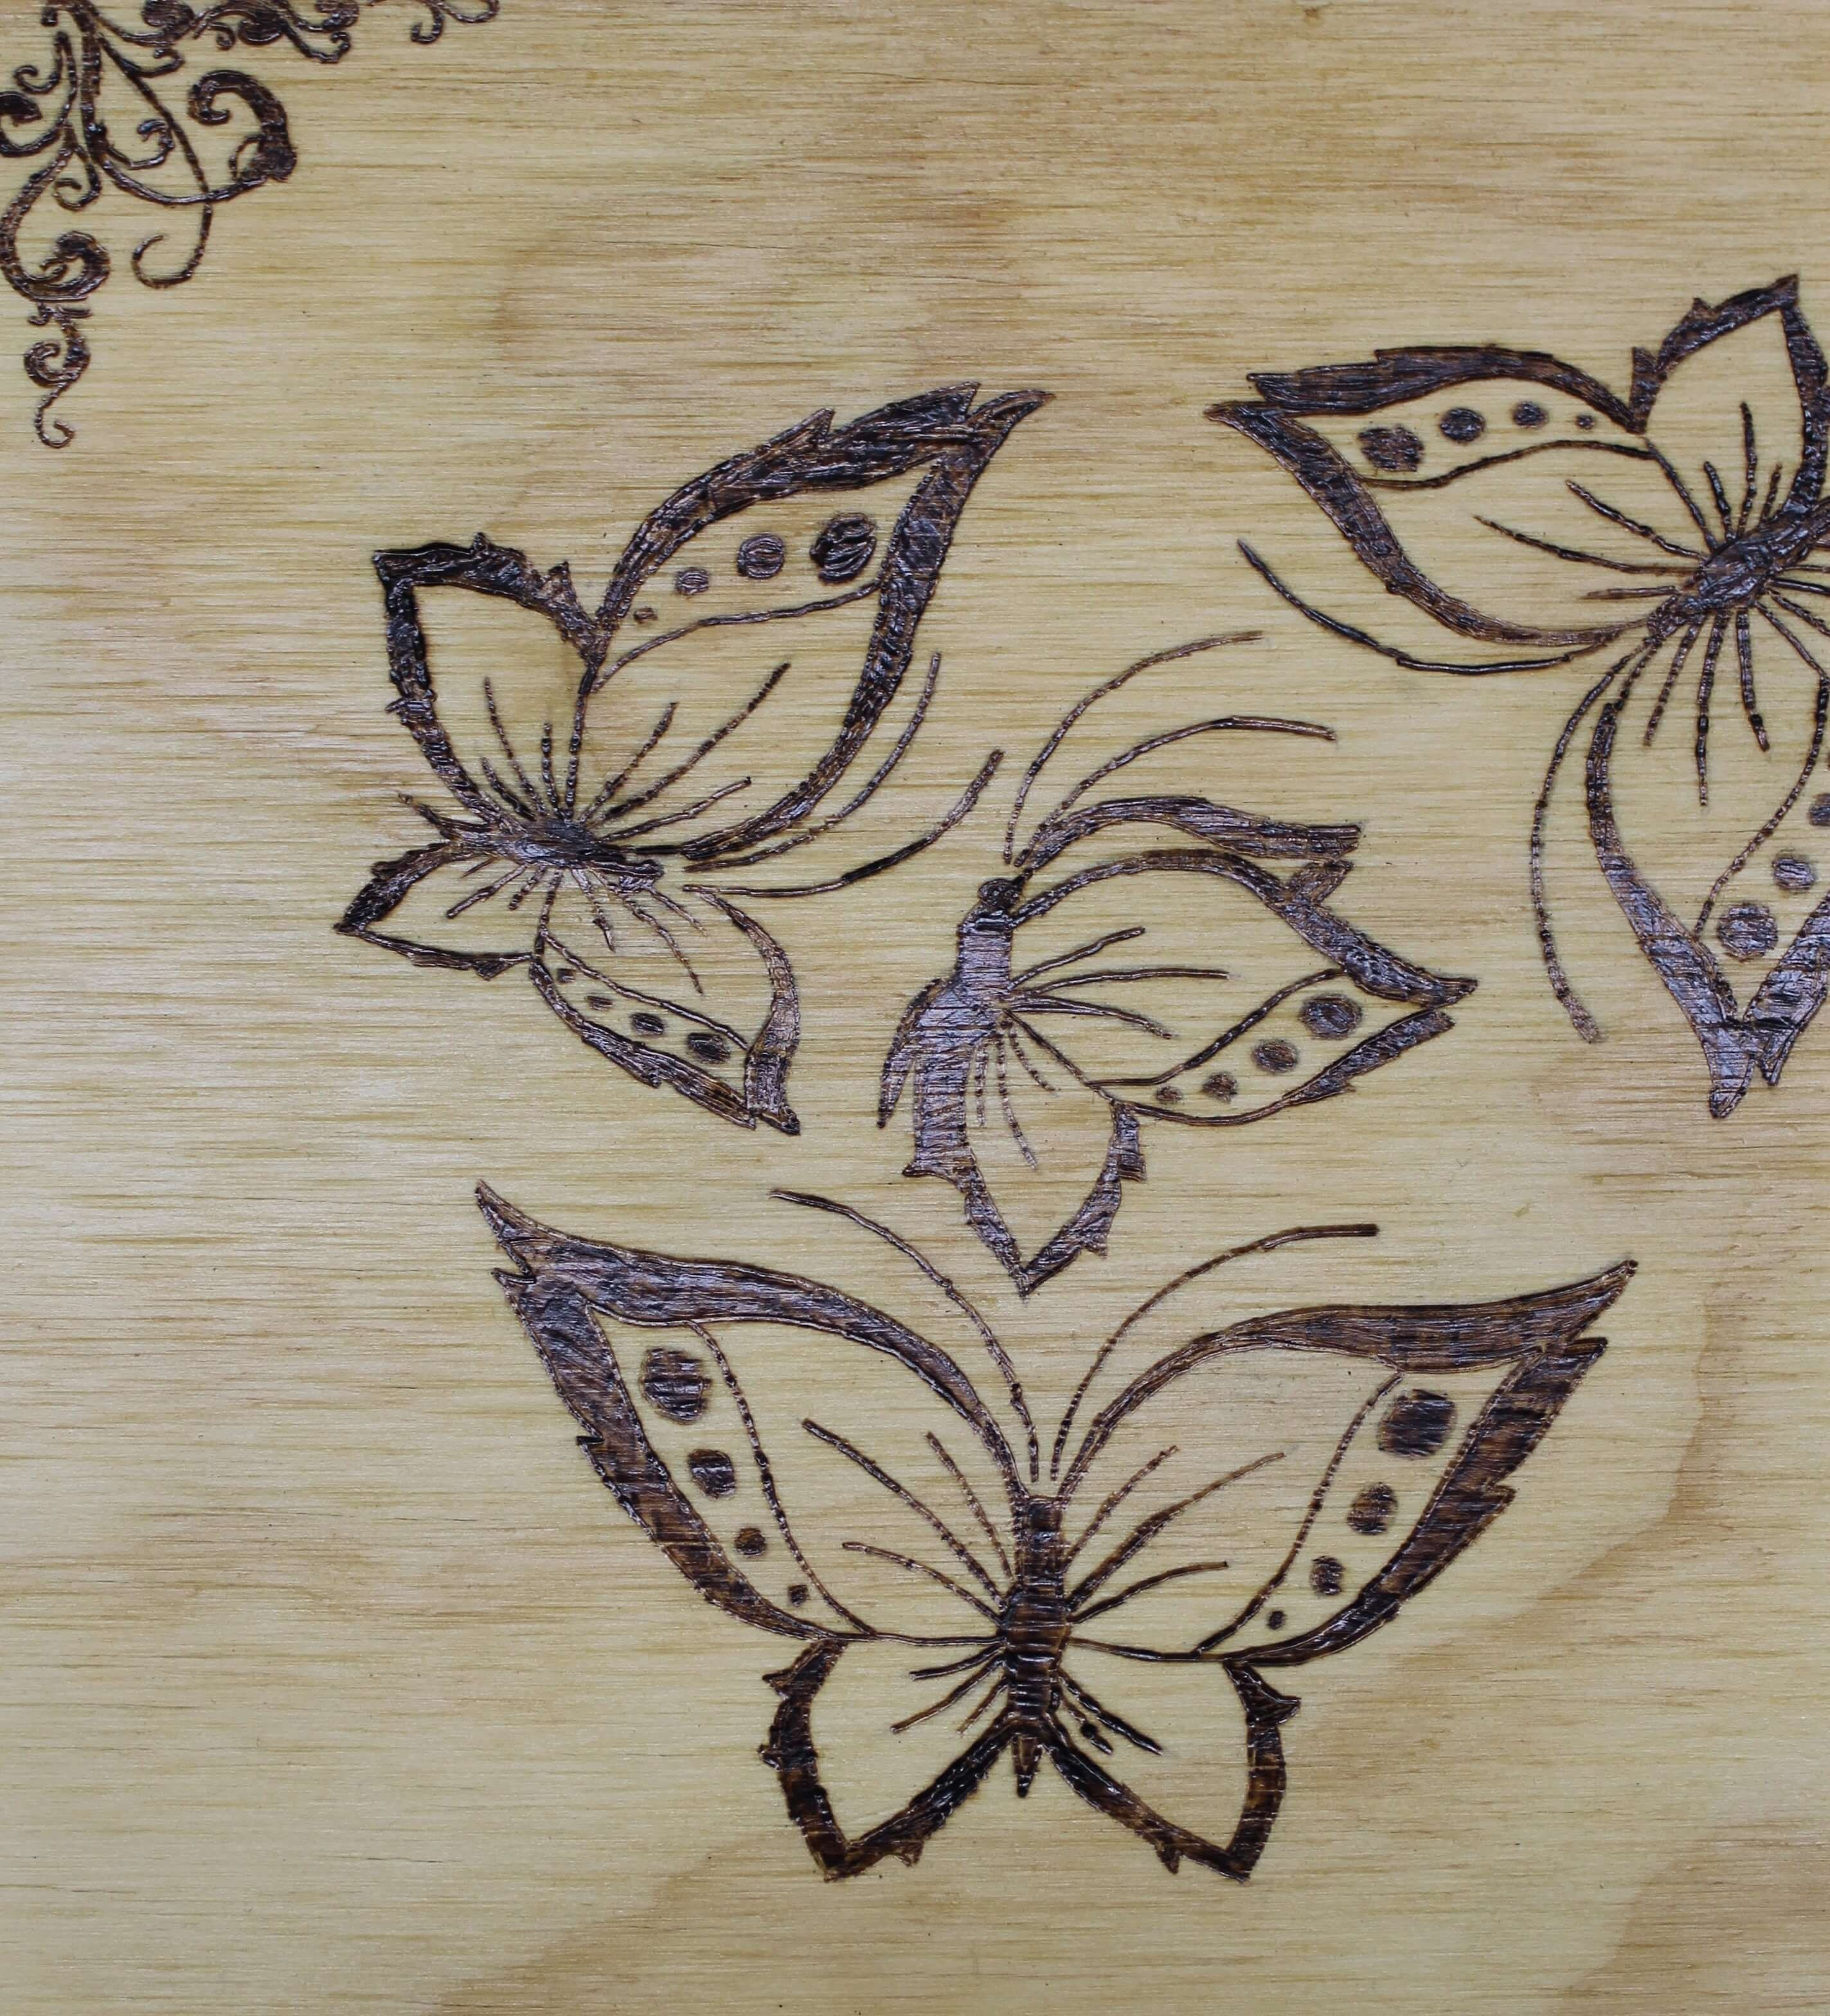 20 Free Printable Wood Burning Patterns For Beginners | Woods | Wood - Free Printable Wood Burning Patterns